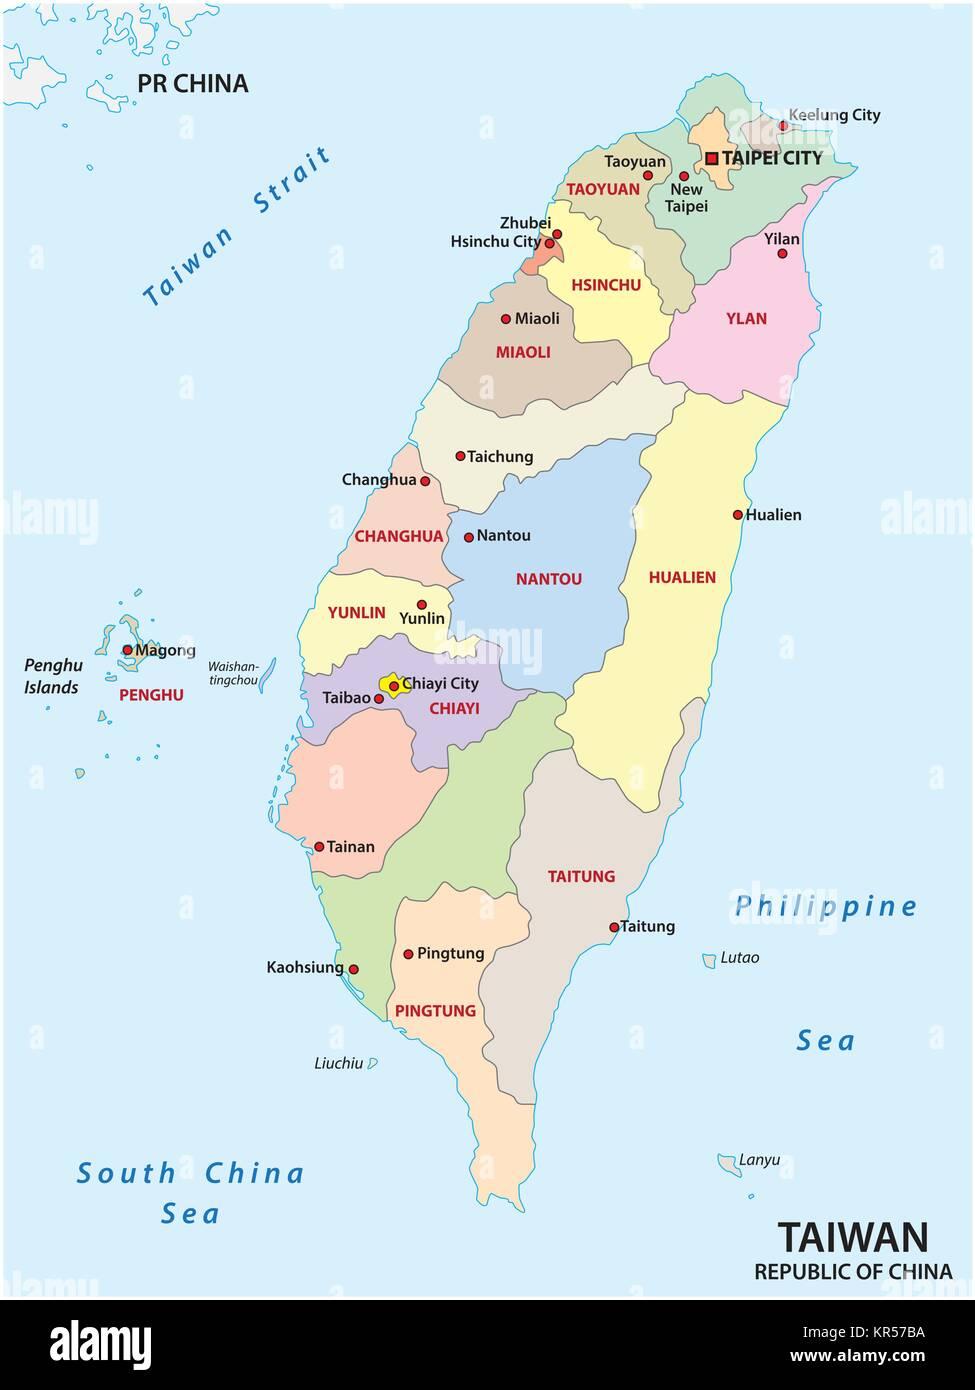 South China Sea Map Stock Photos South China Sea Map Stock Images